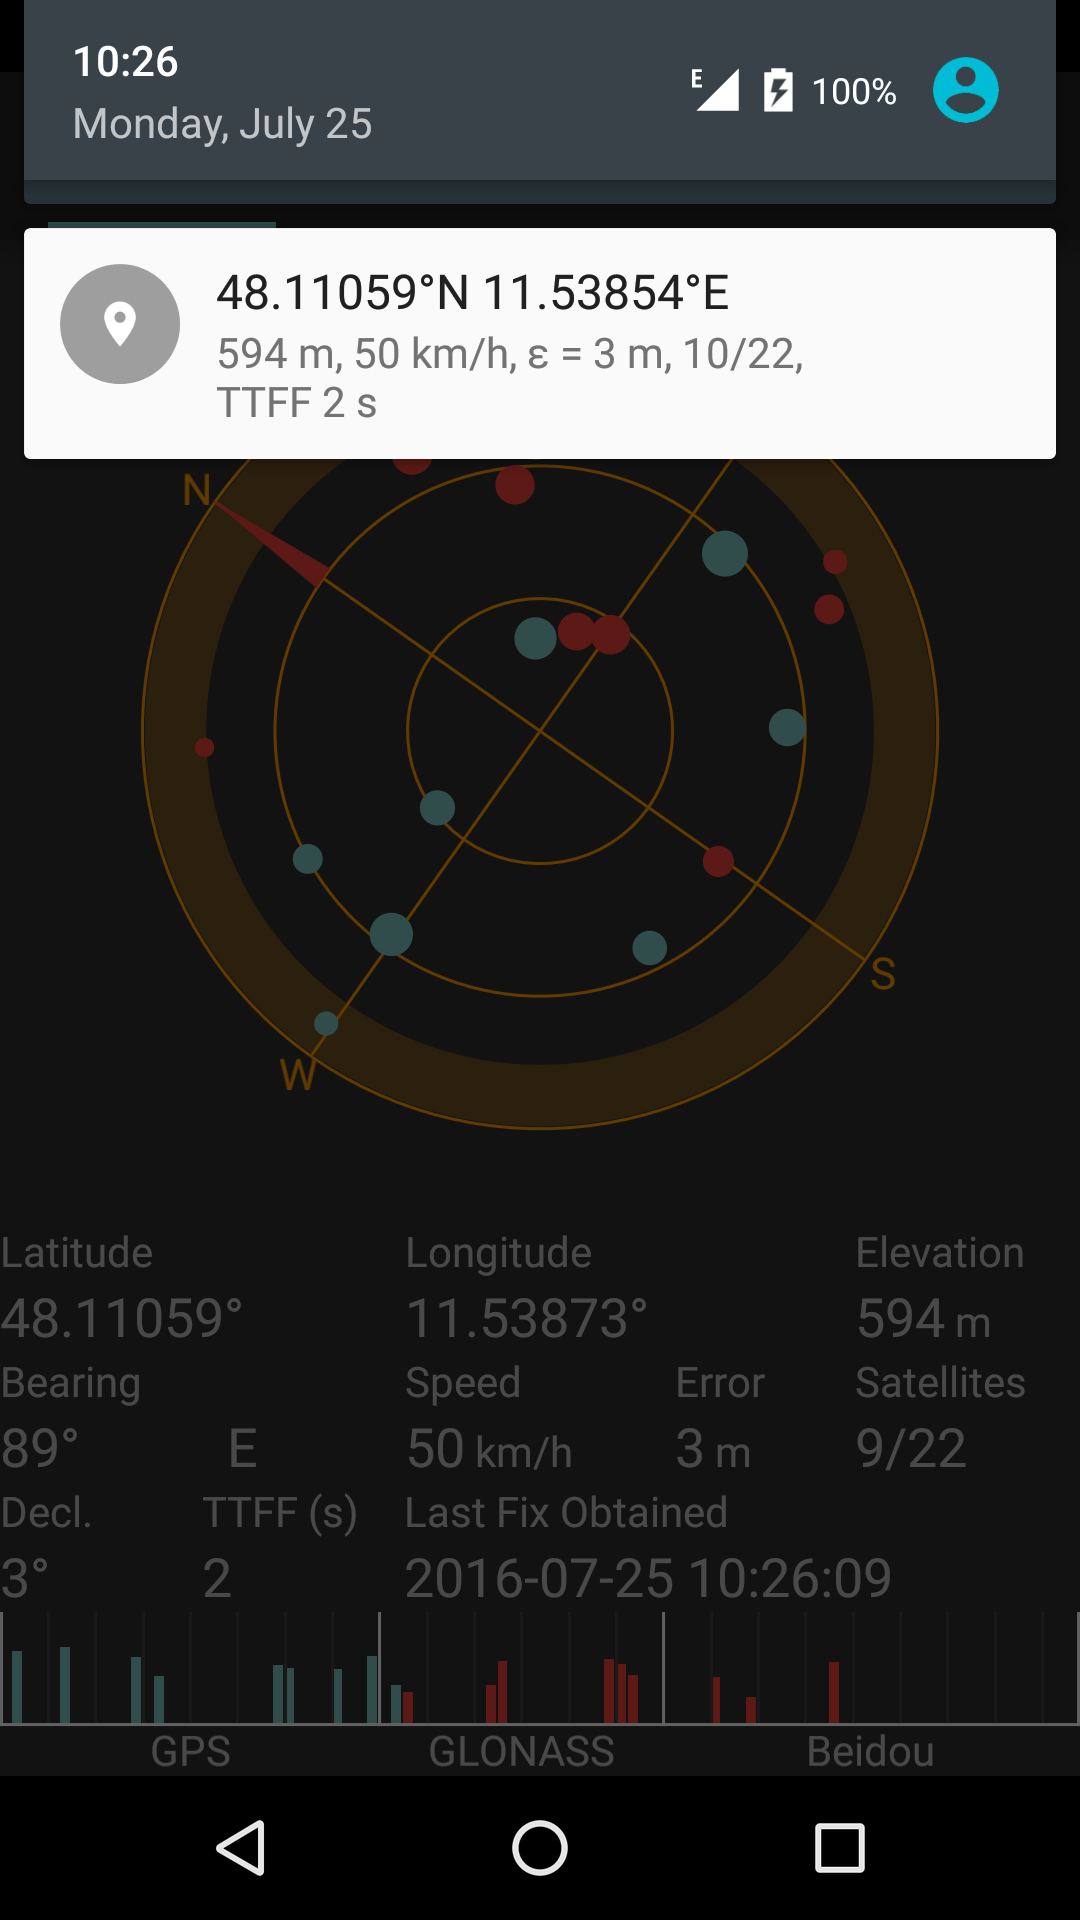 GPS notification in SatStat with fix